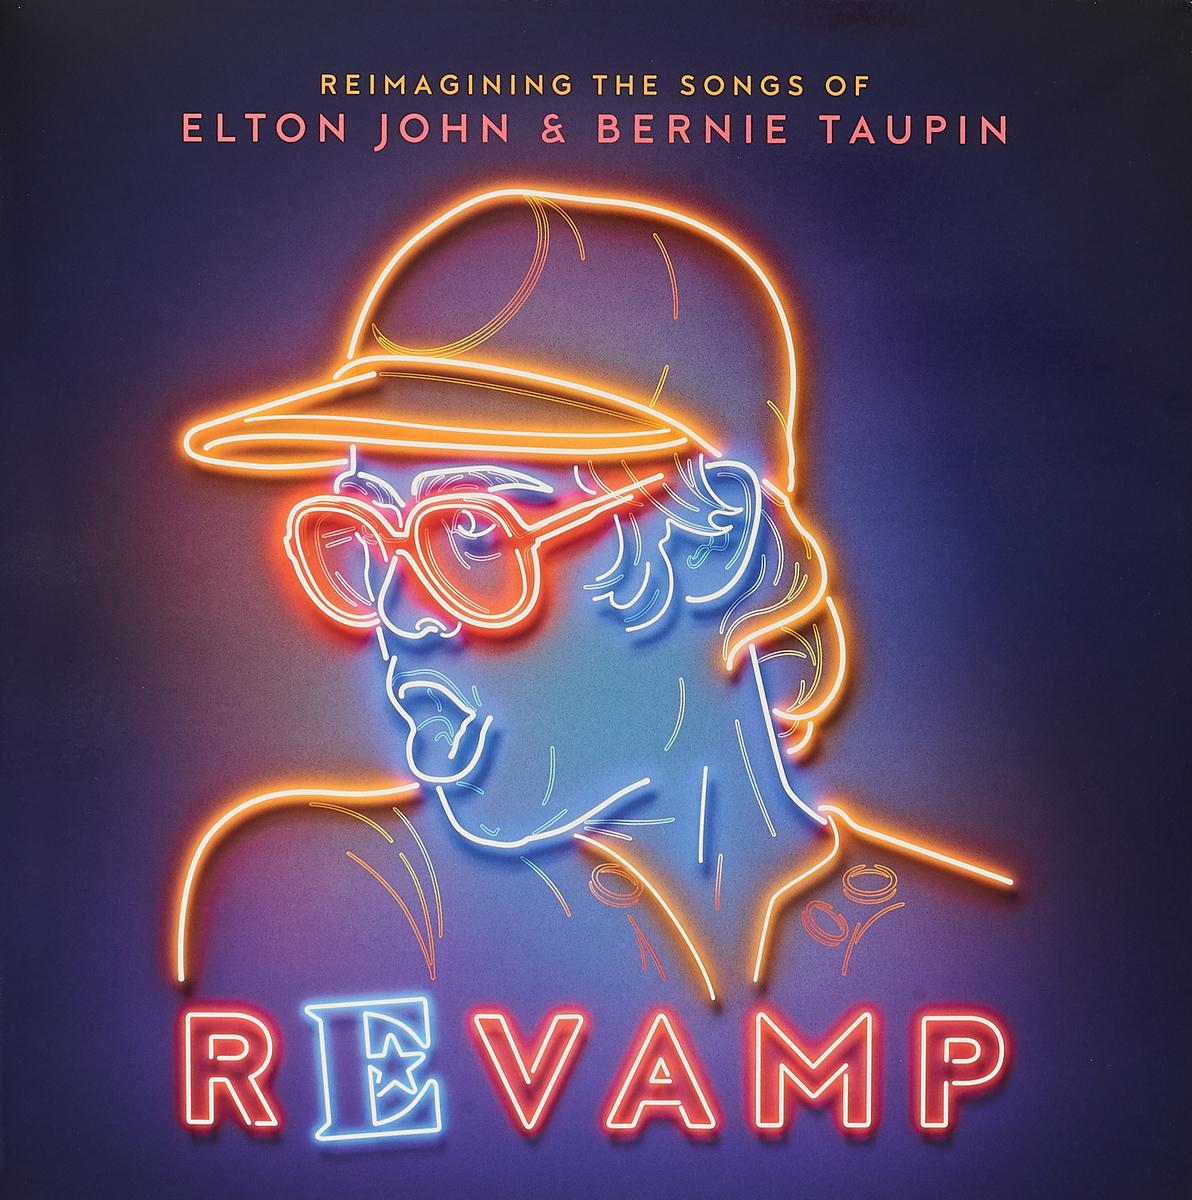 Элтон Джон,Берни Топин Various Artists. Revamp: The Songs Of Elton John & Bernie Taupin (2 LP) various artists various artists restoration the songs of elton john and bernie taupin 2 lp